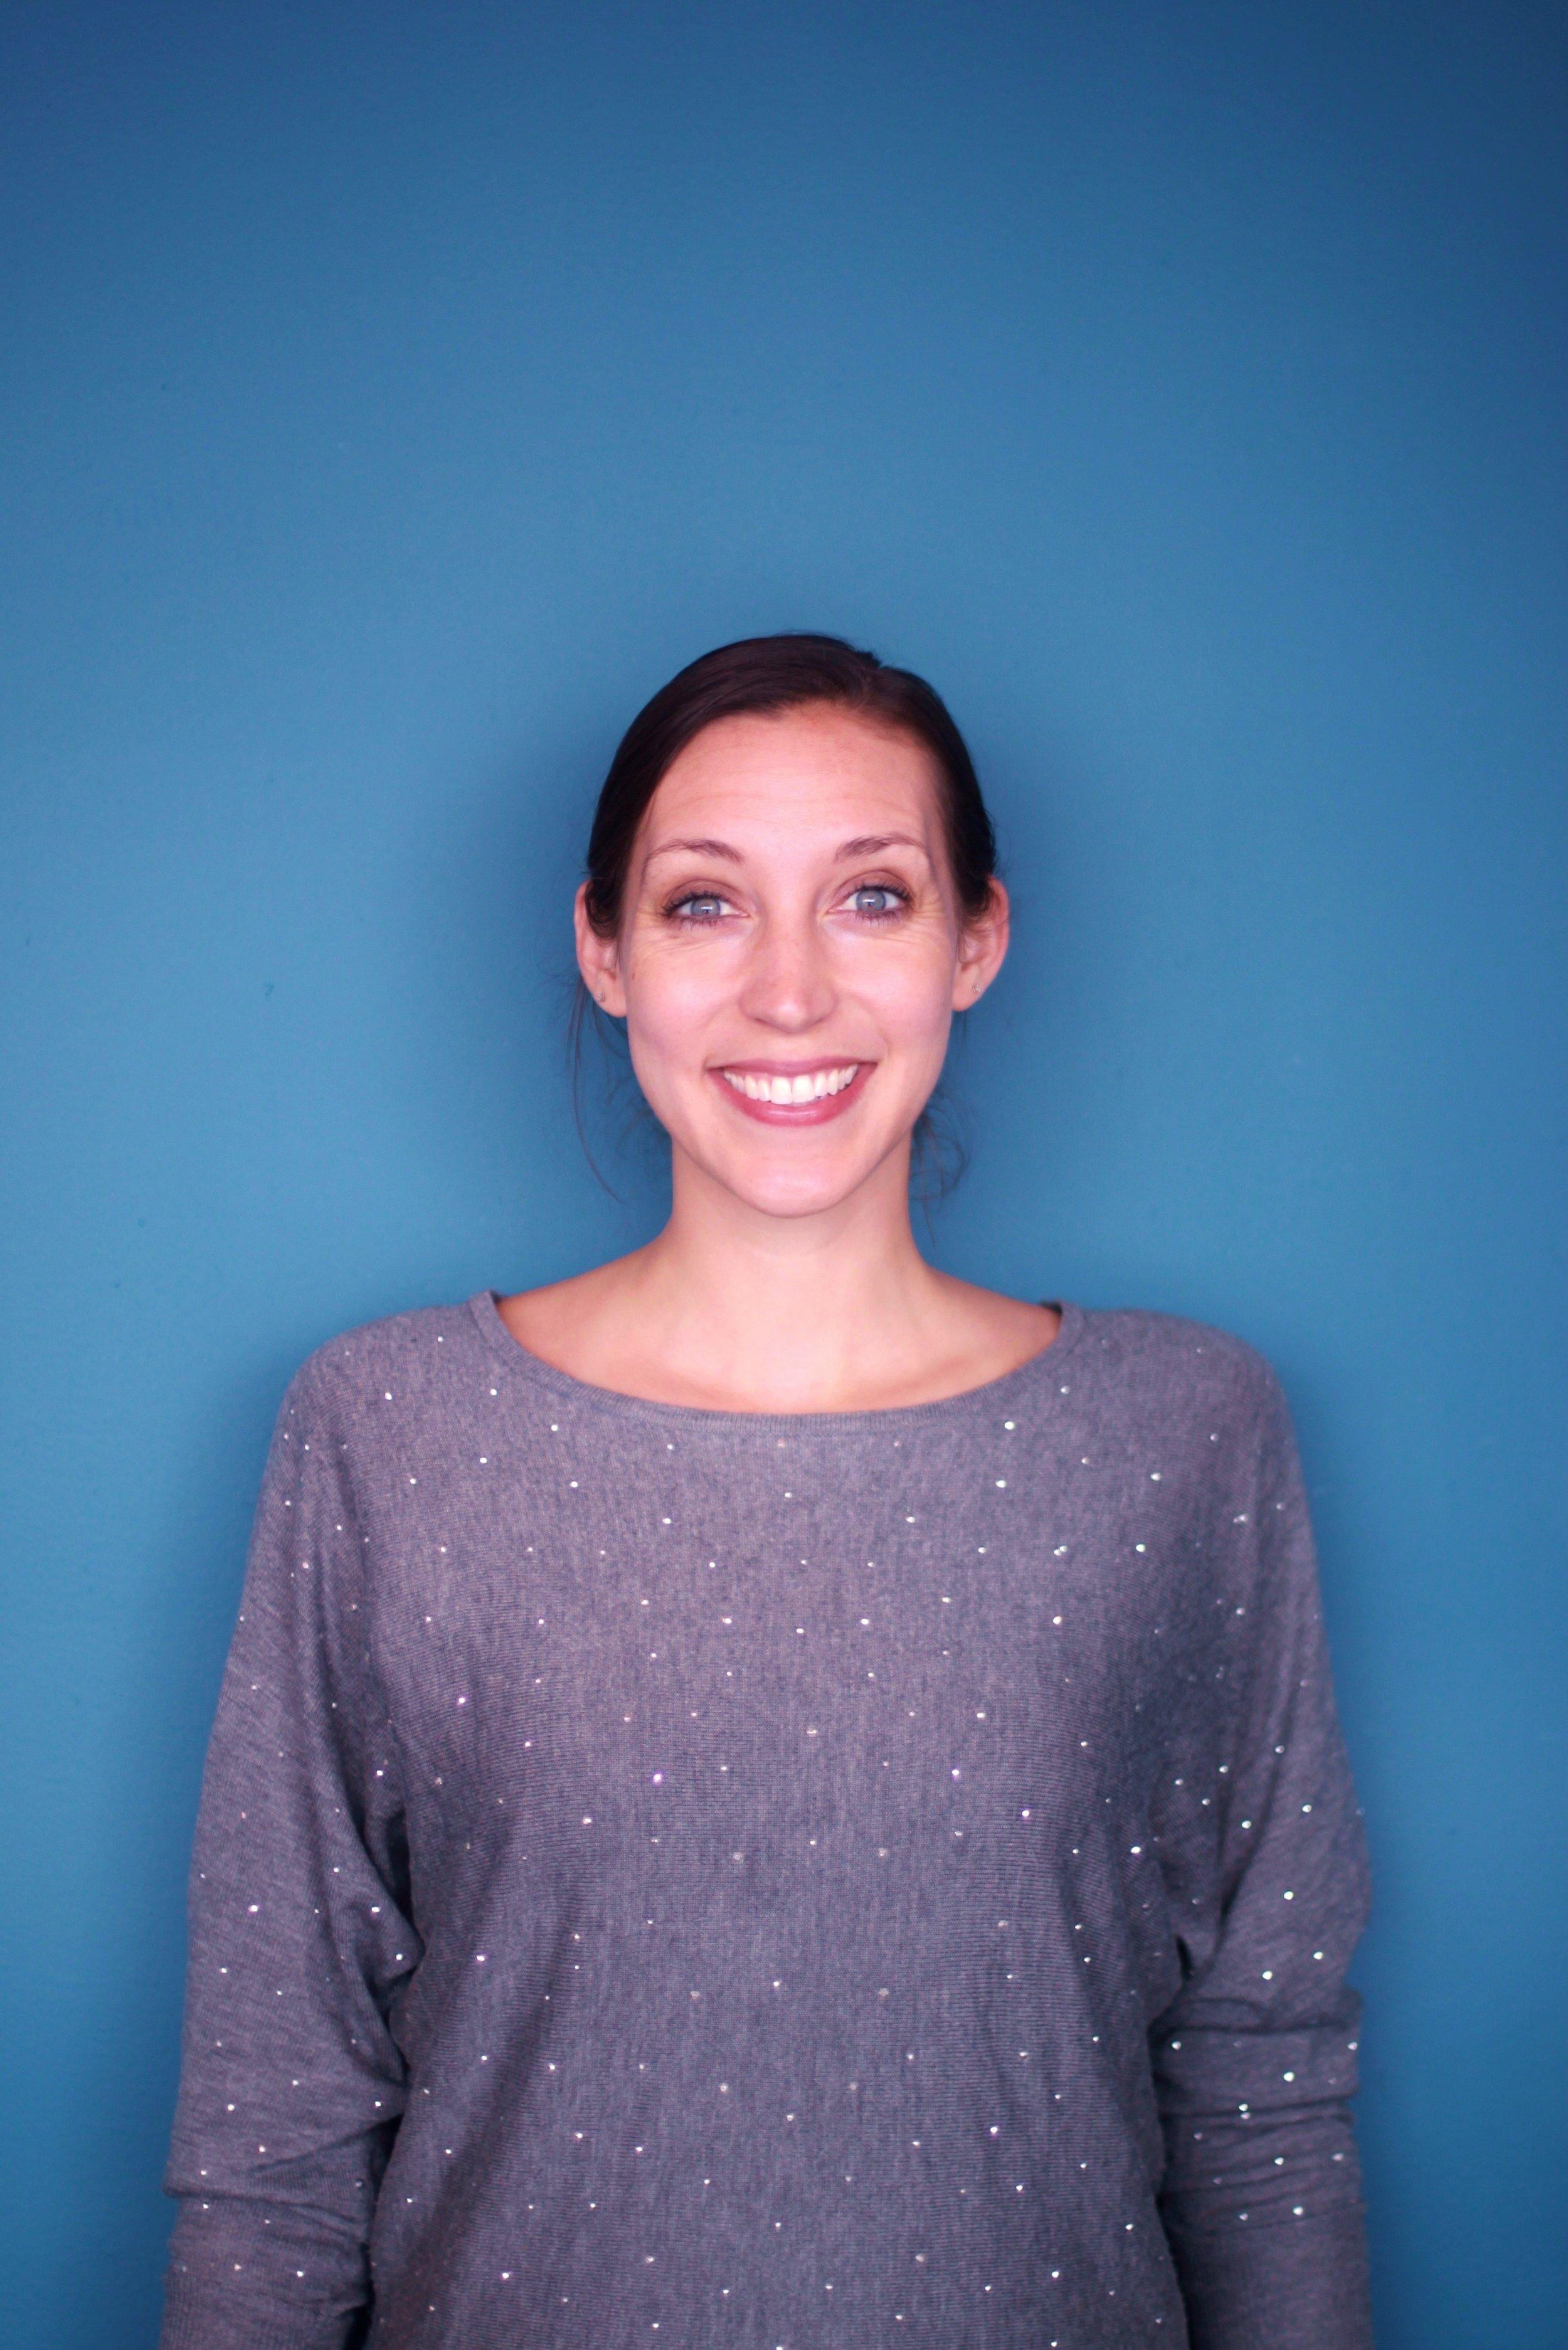 Kristen B. Long, PhD (Post-doctoral Researcher)